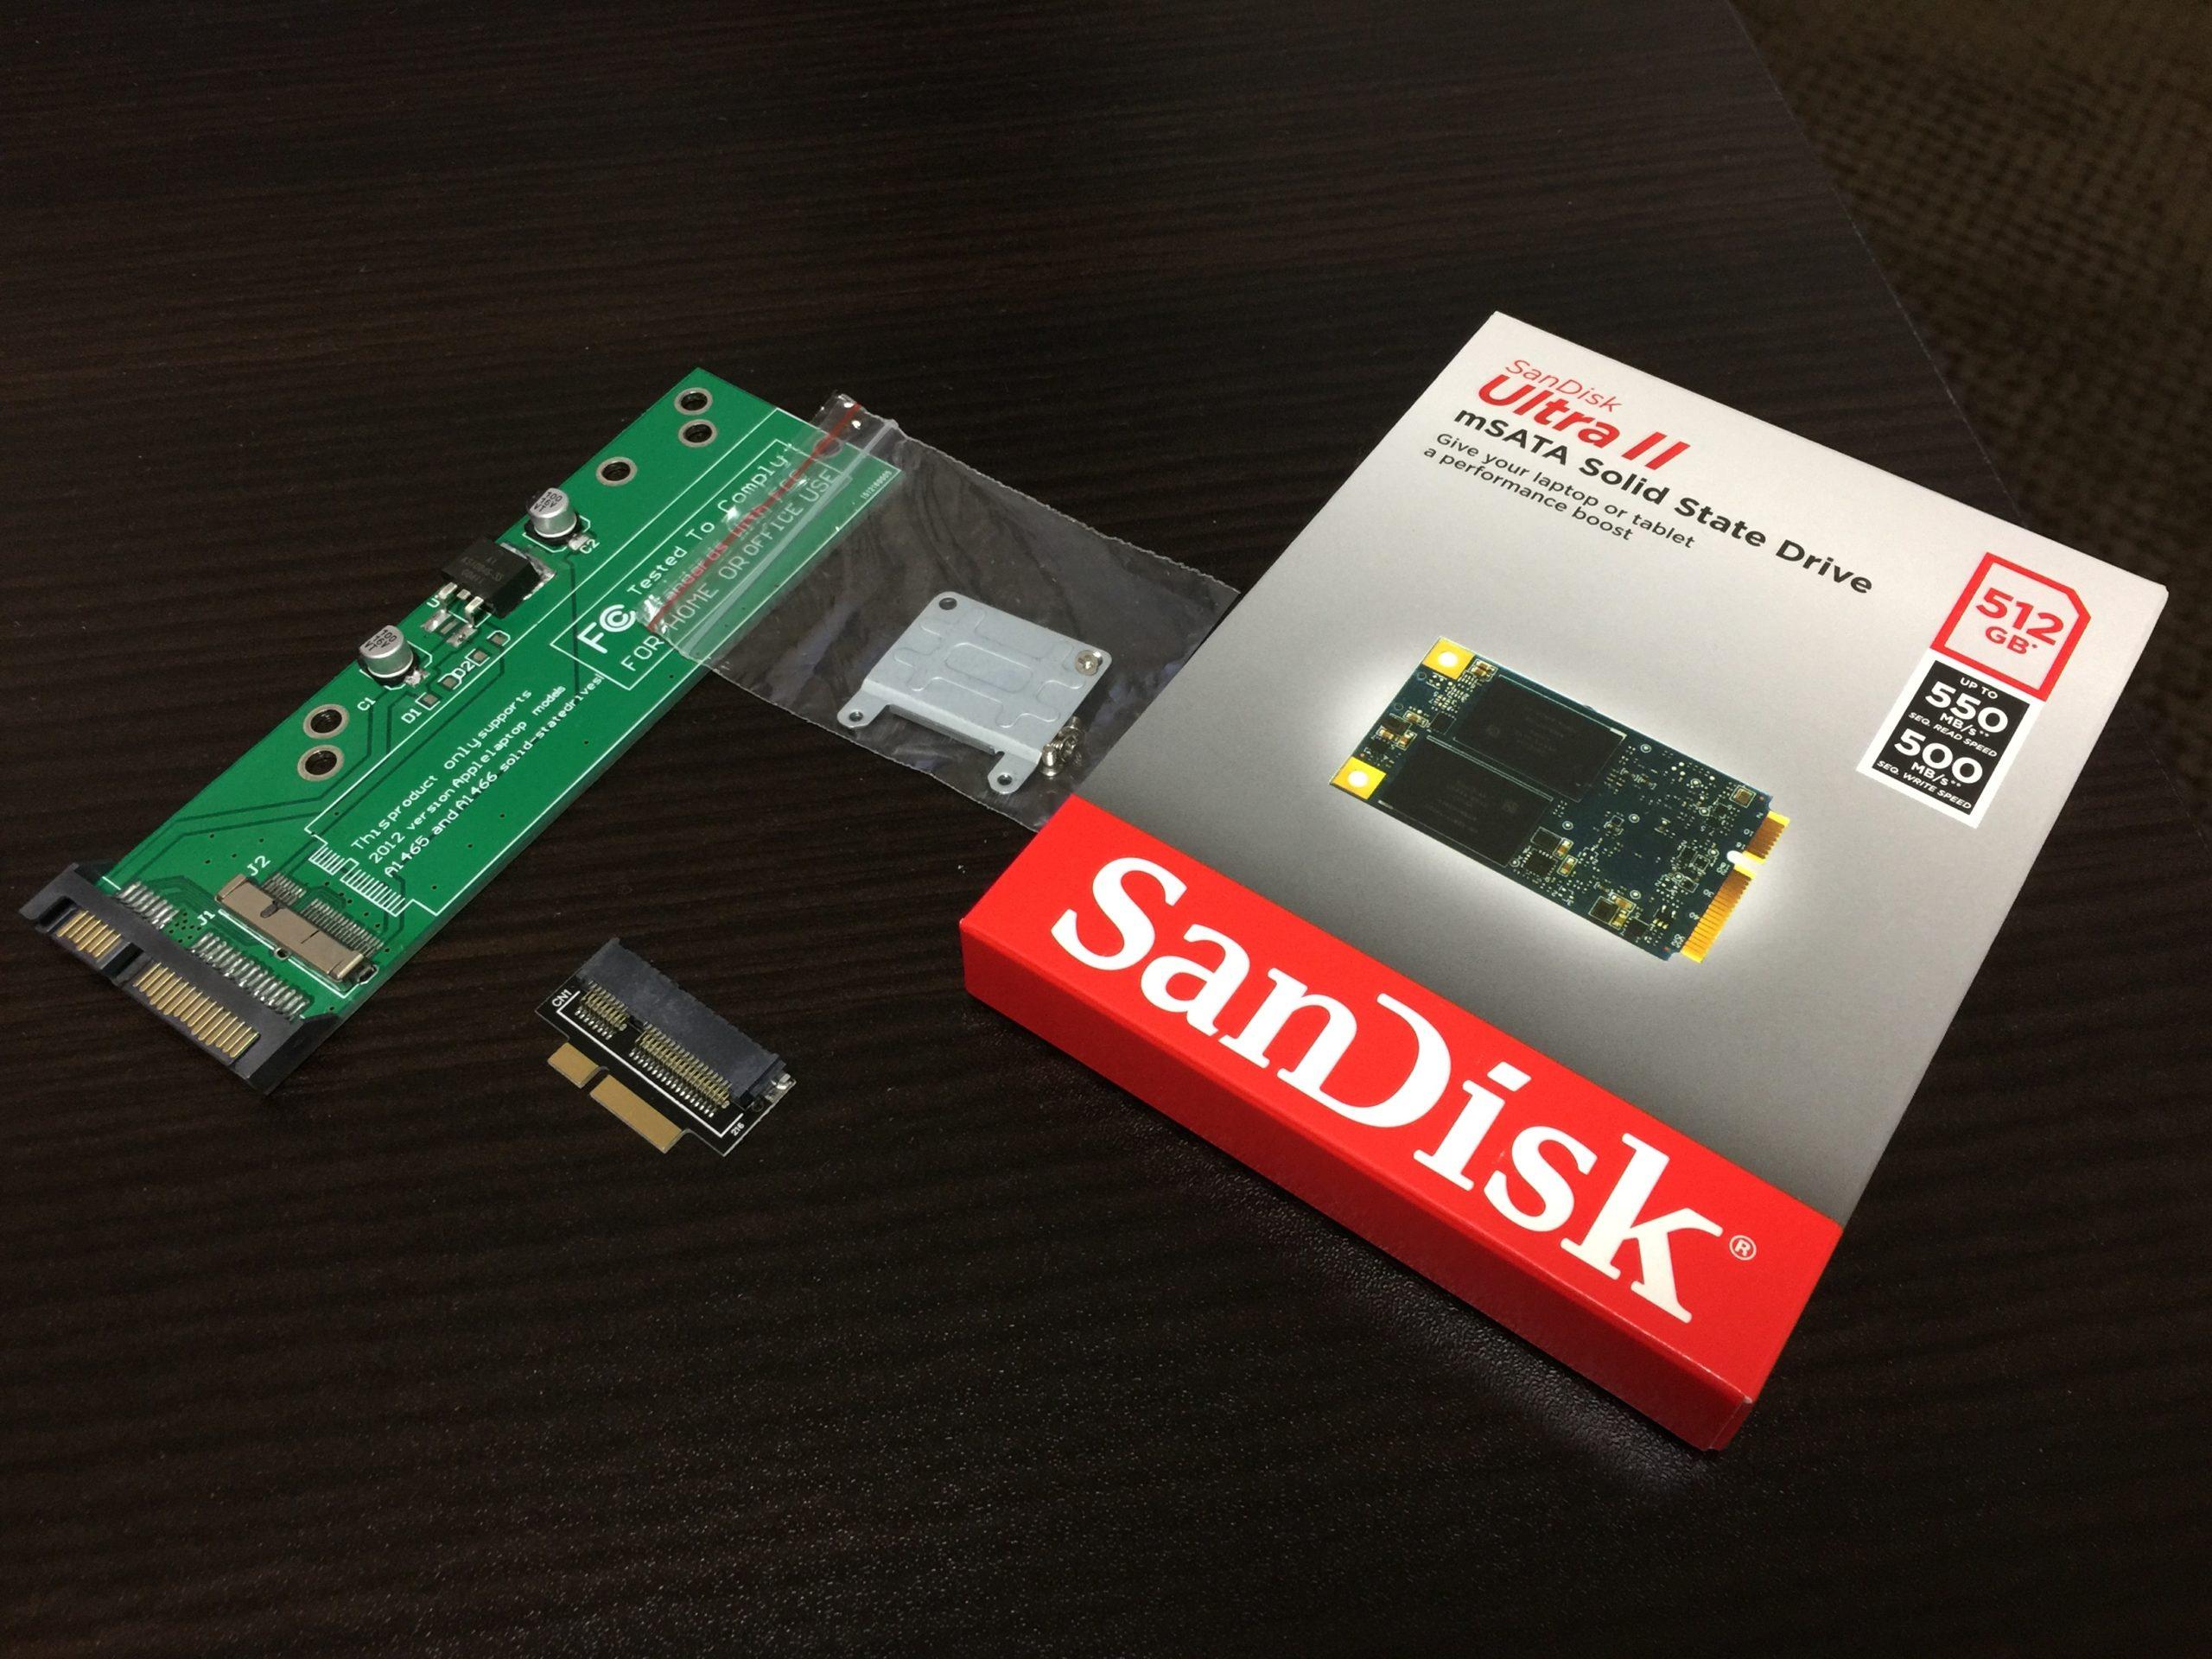 MacBookPro RetinaのSSD容量を増やすには?mSATAのSSD換装で安く増設する方法を解説